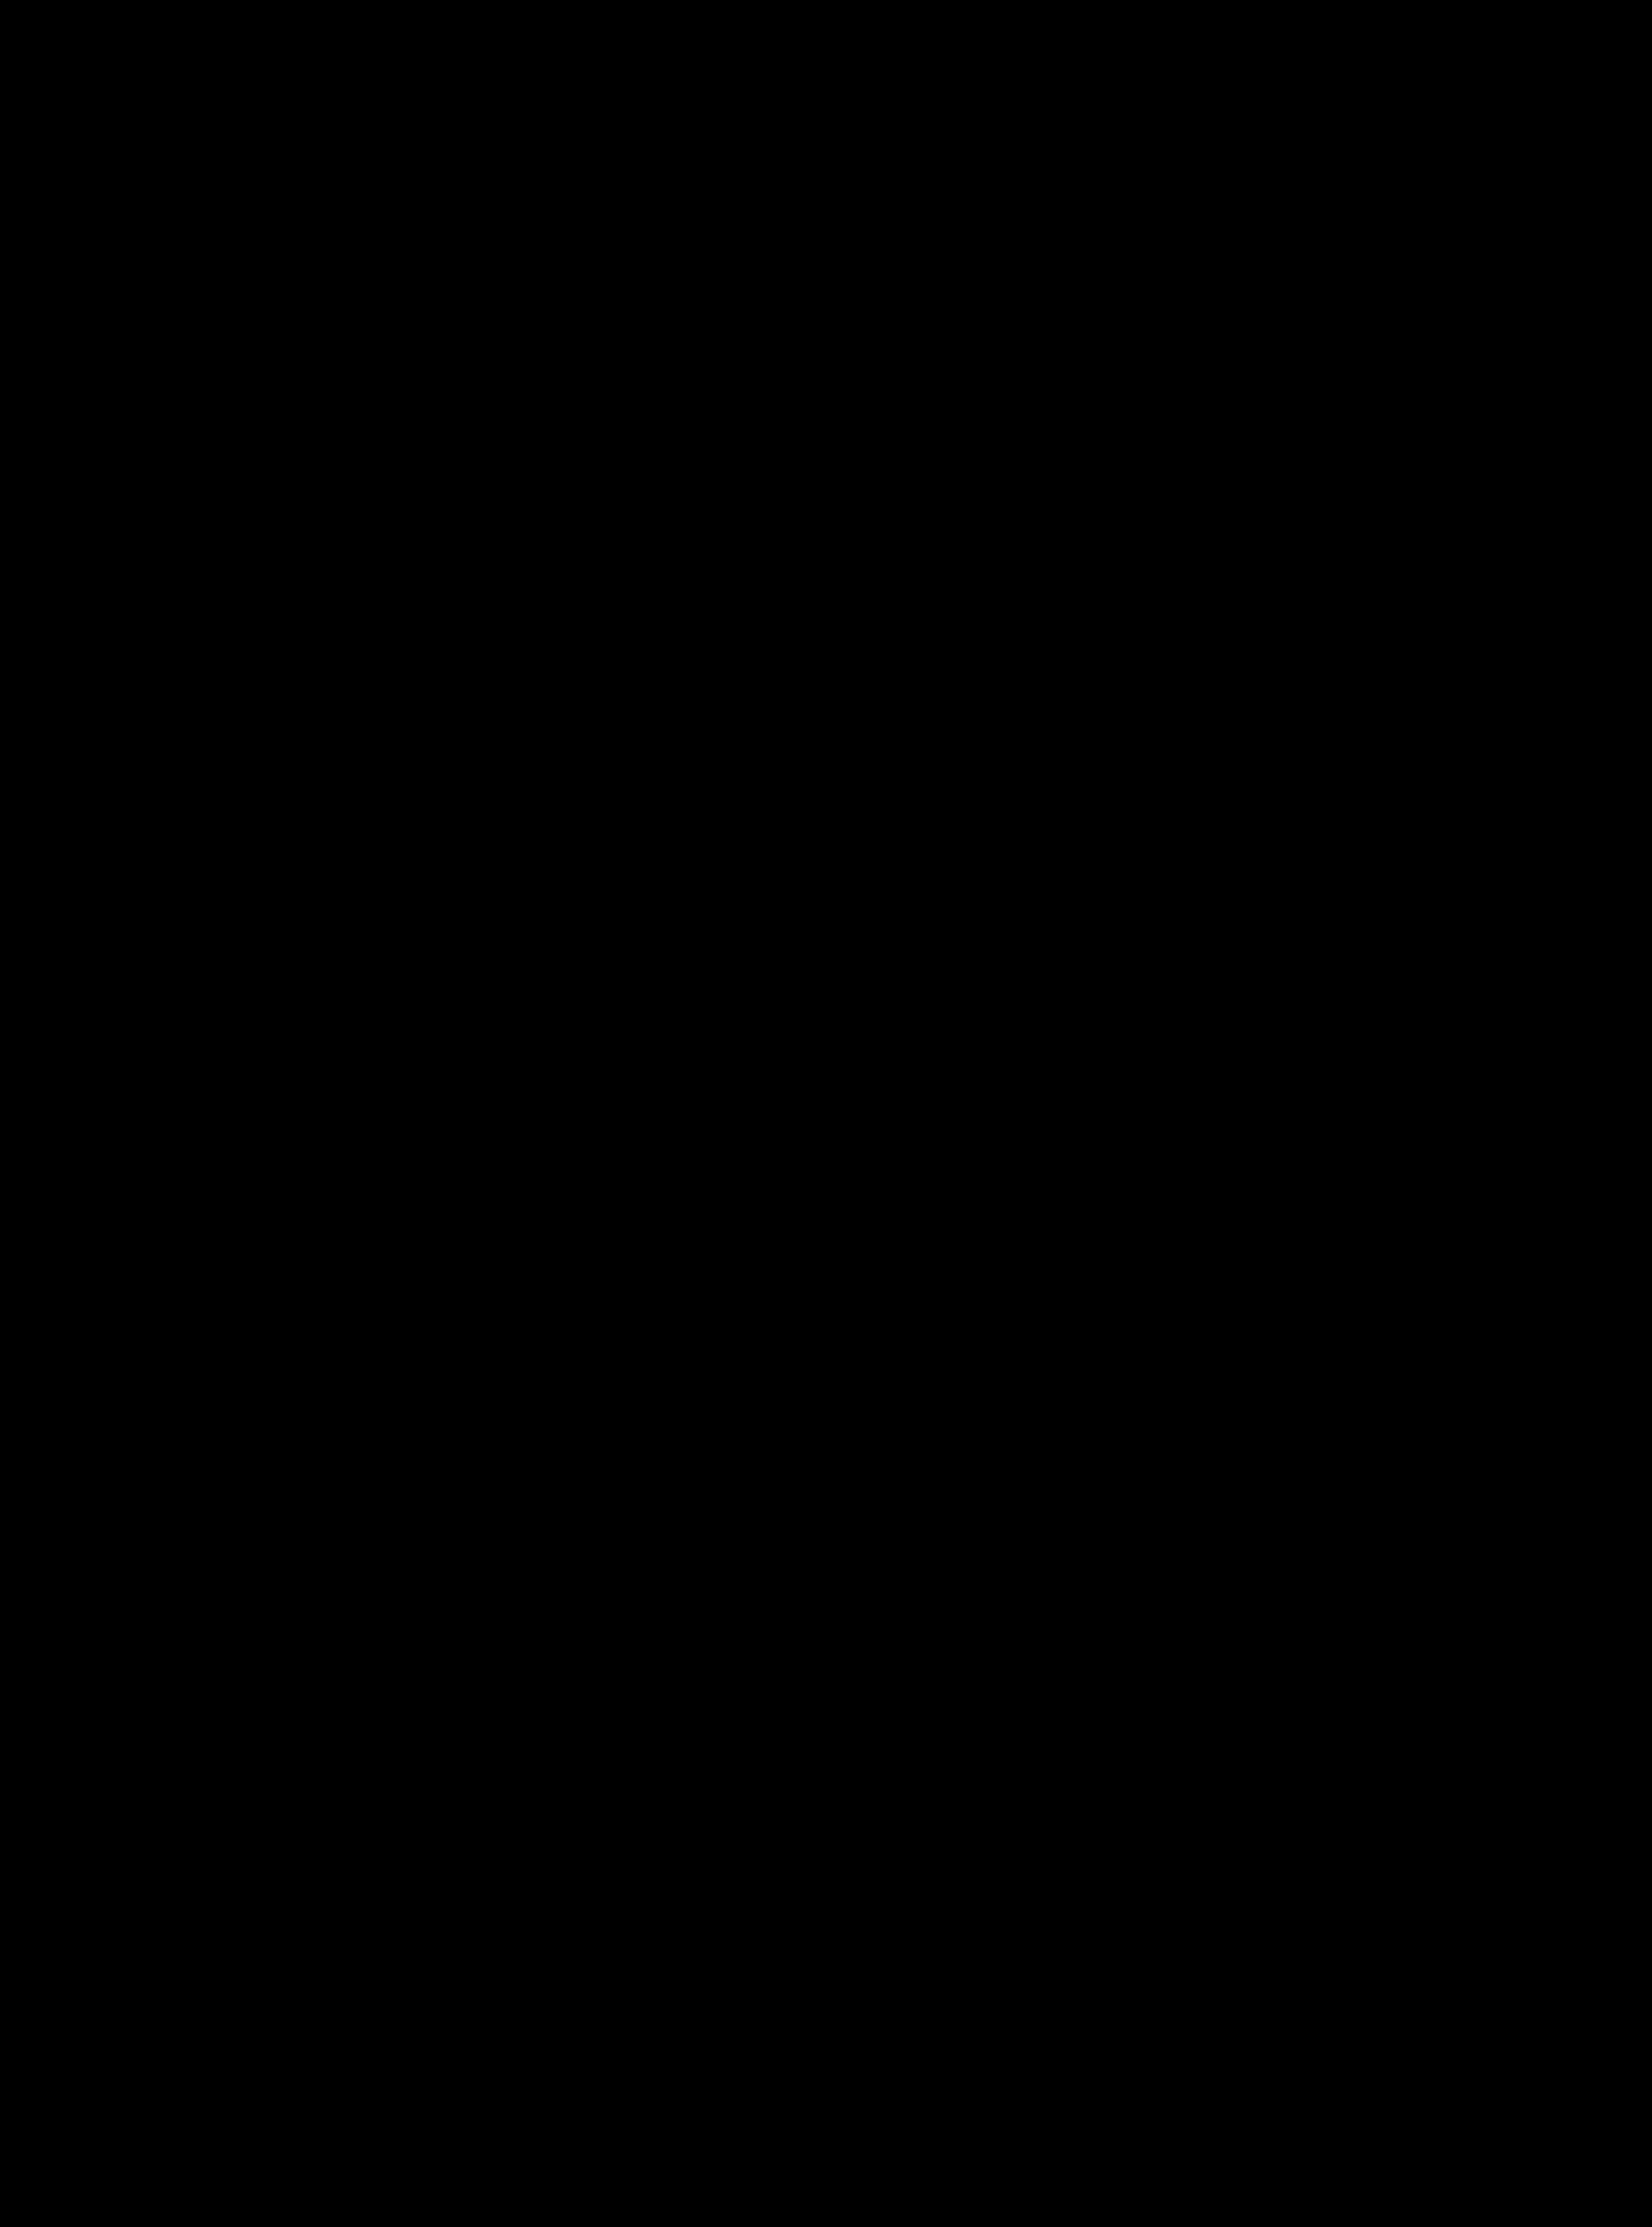 Salon Comb SVG Cut File